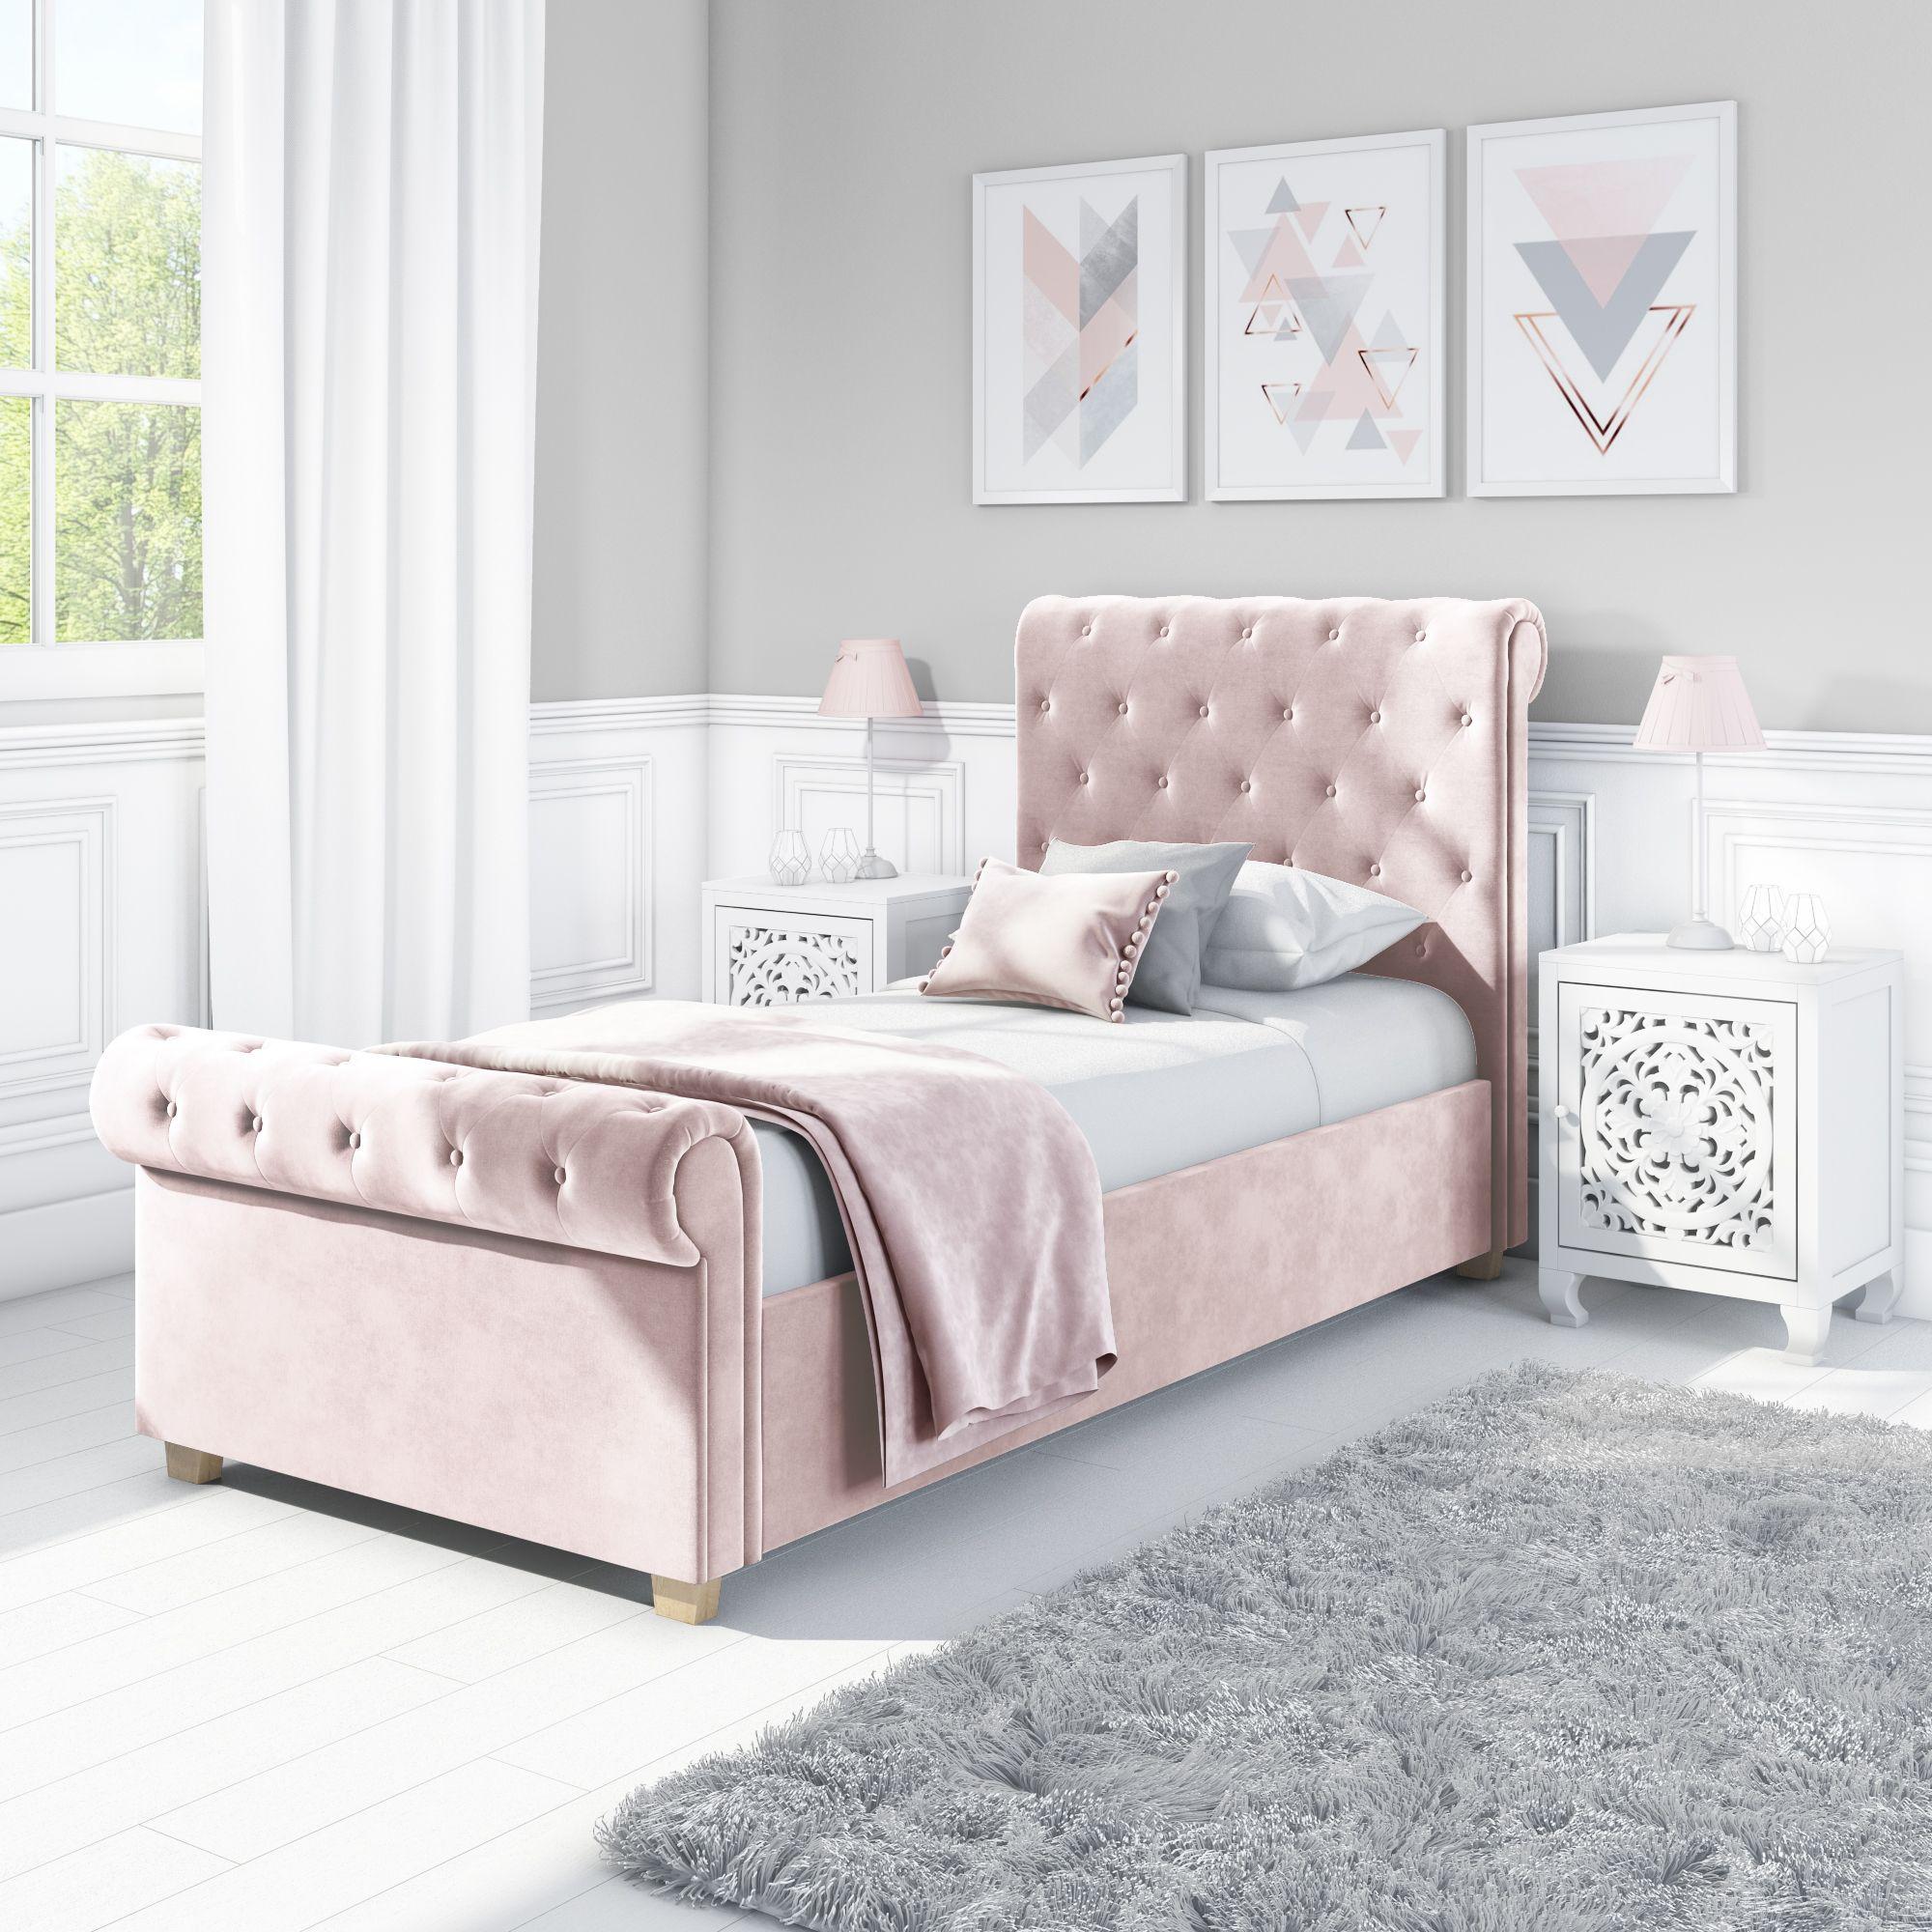 Safina Roll Top Single Sleigh Bed In Baby Pink Velvet Kids Bed